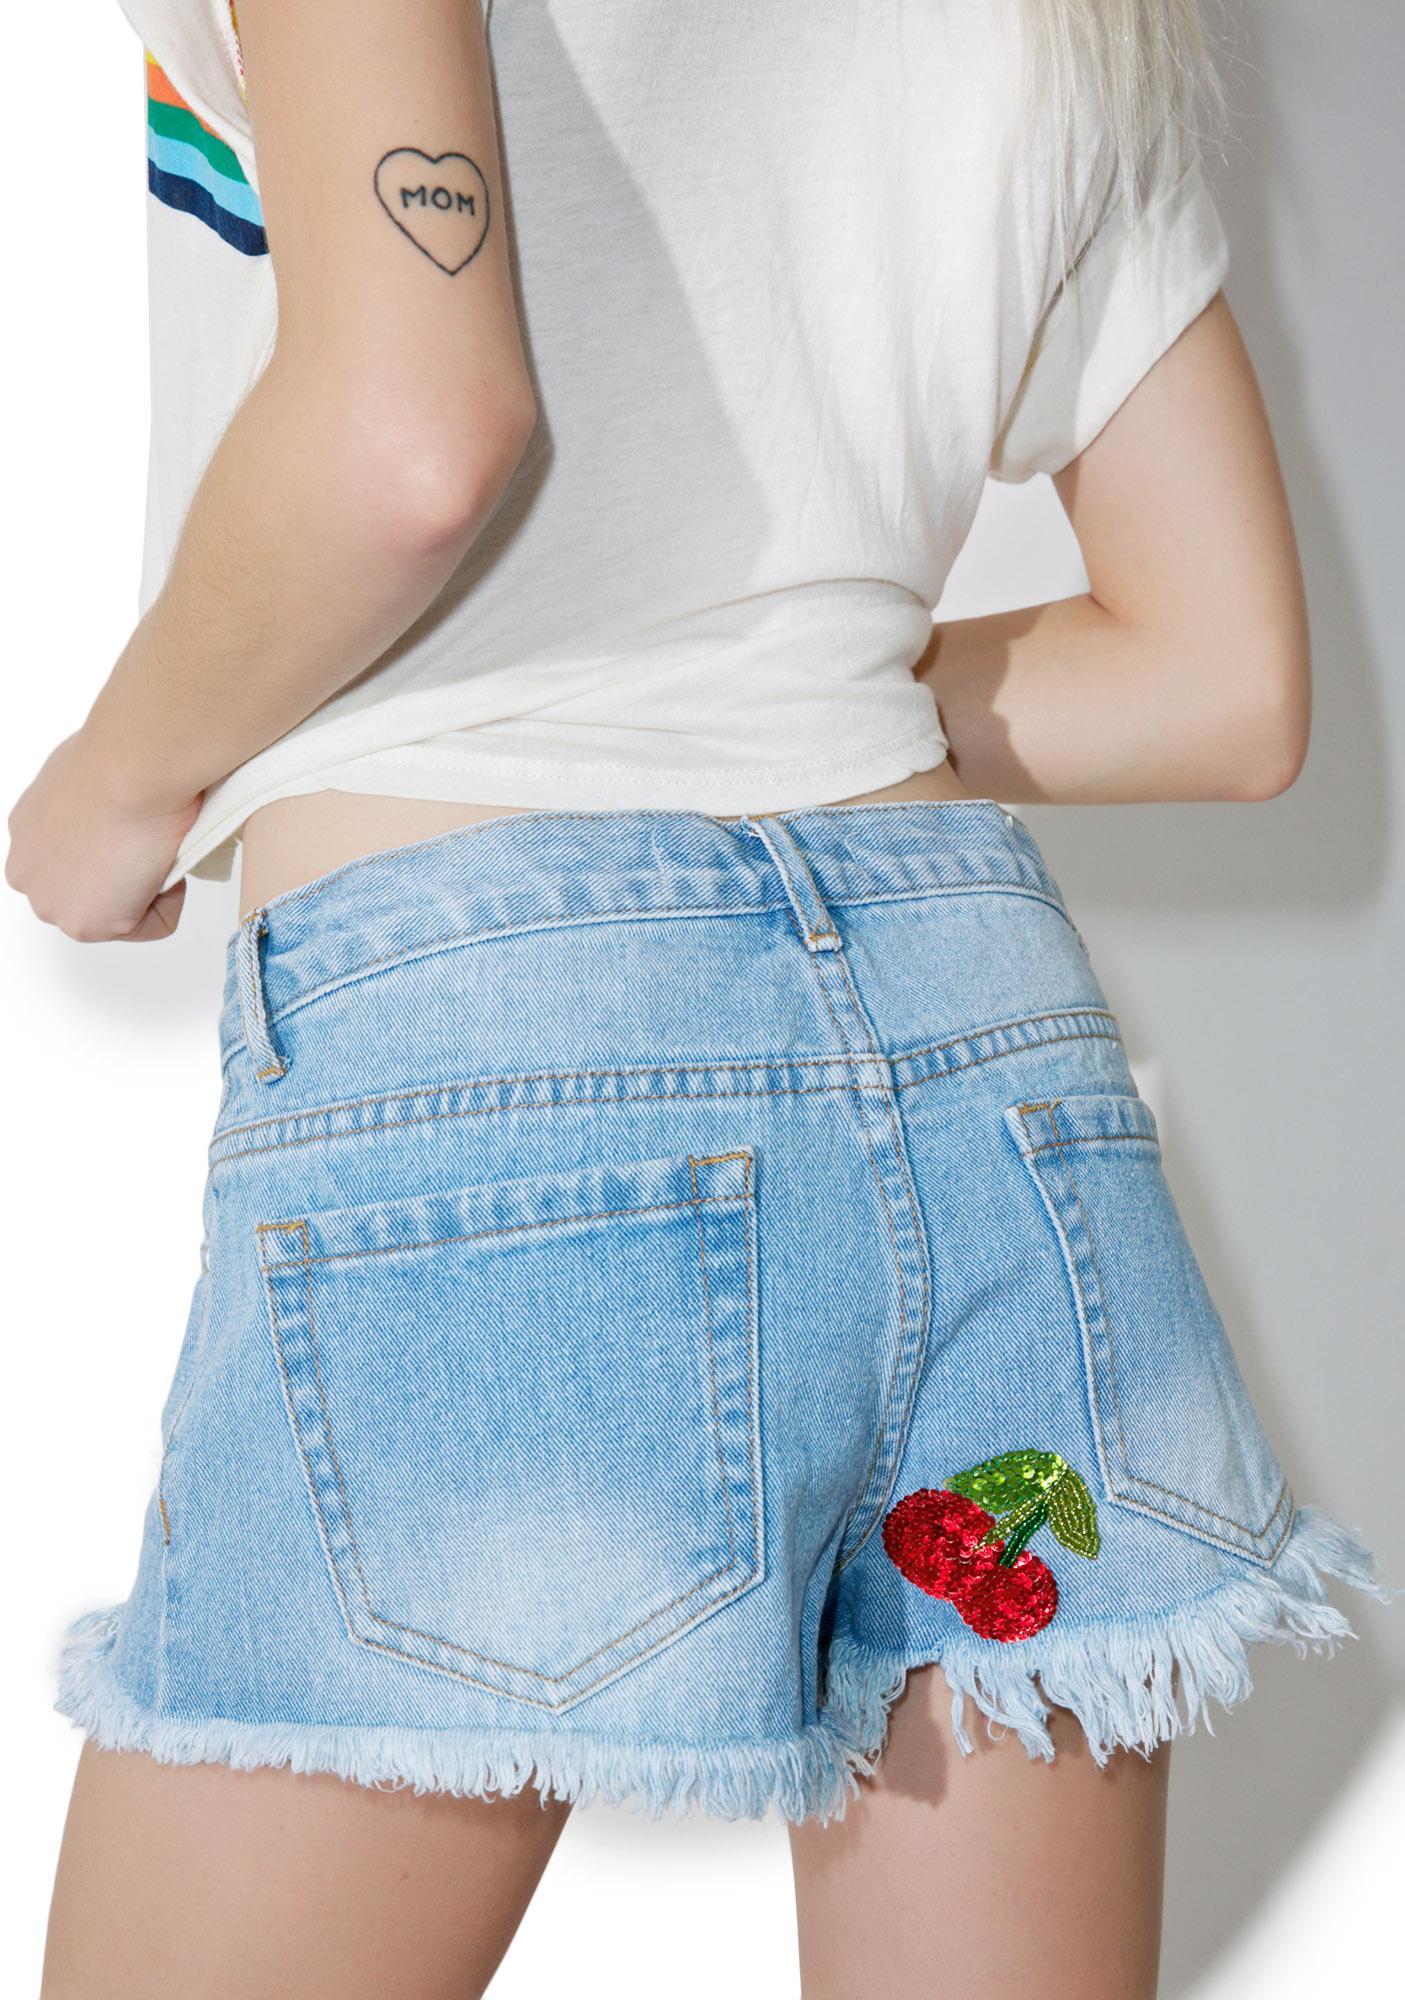 Rad and Refined Cherry Denim Shorts